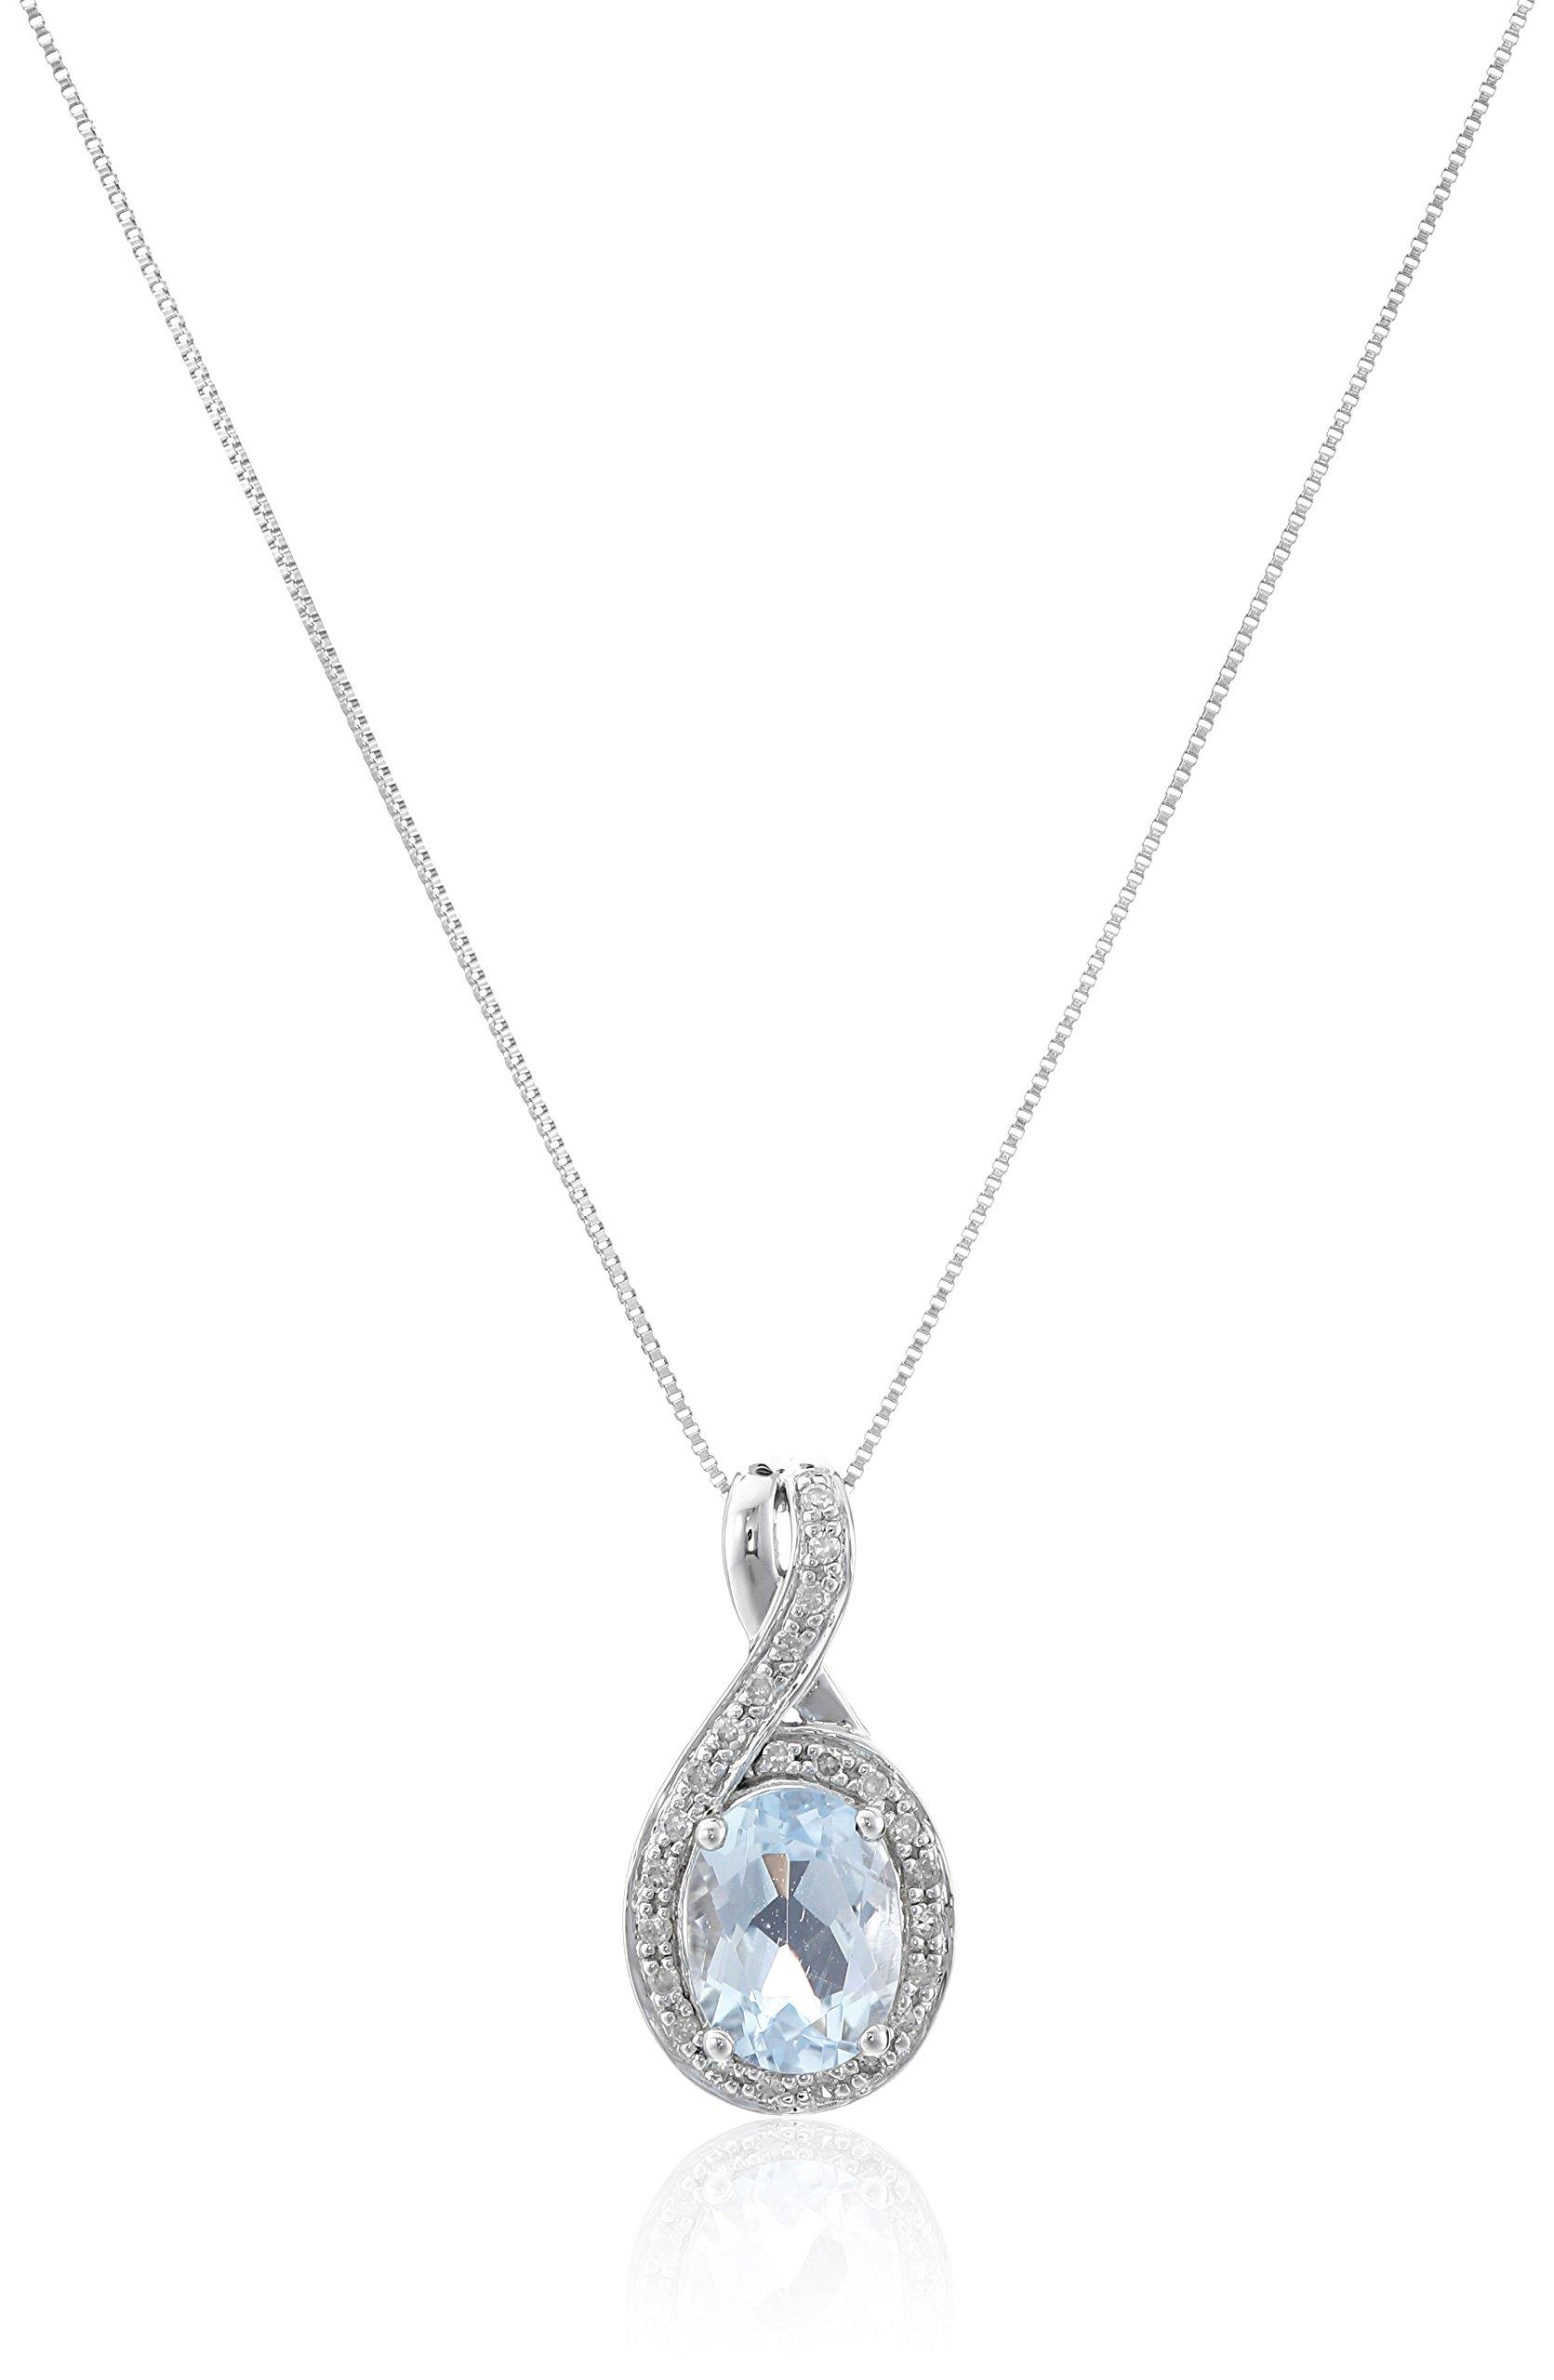 14k White Gold, Aquamarine, and Diamond (1/10 cttw, H-I Color, I2-I3 Clarity) Oval Pendant Necklace, 18''